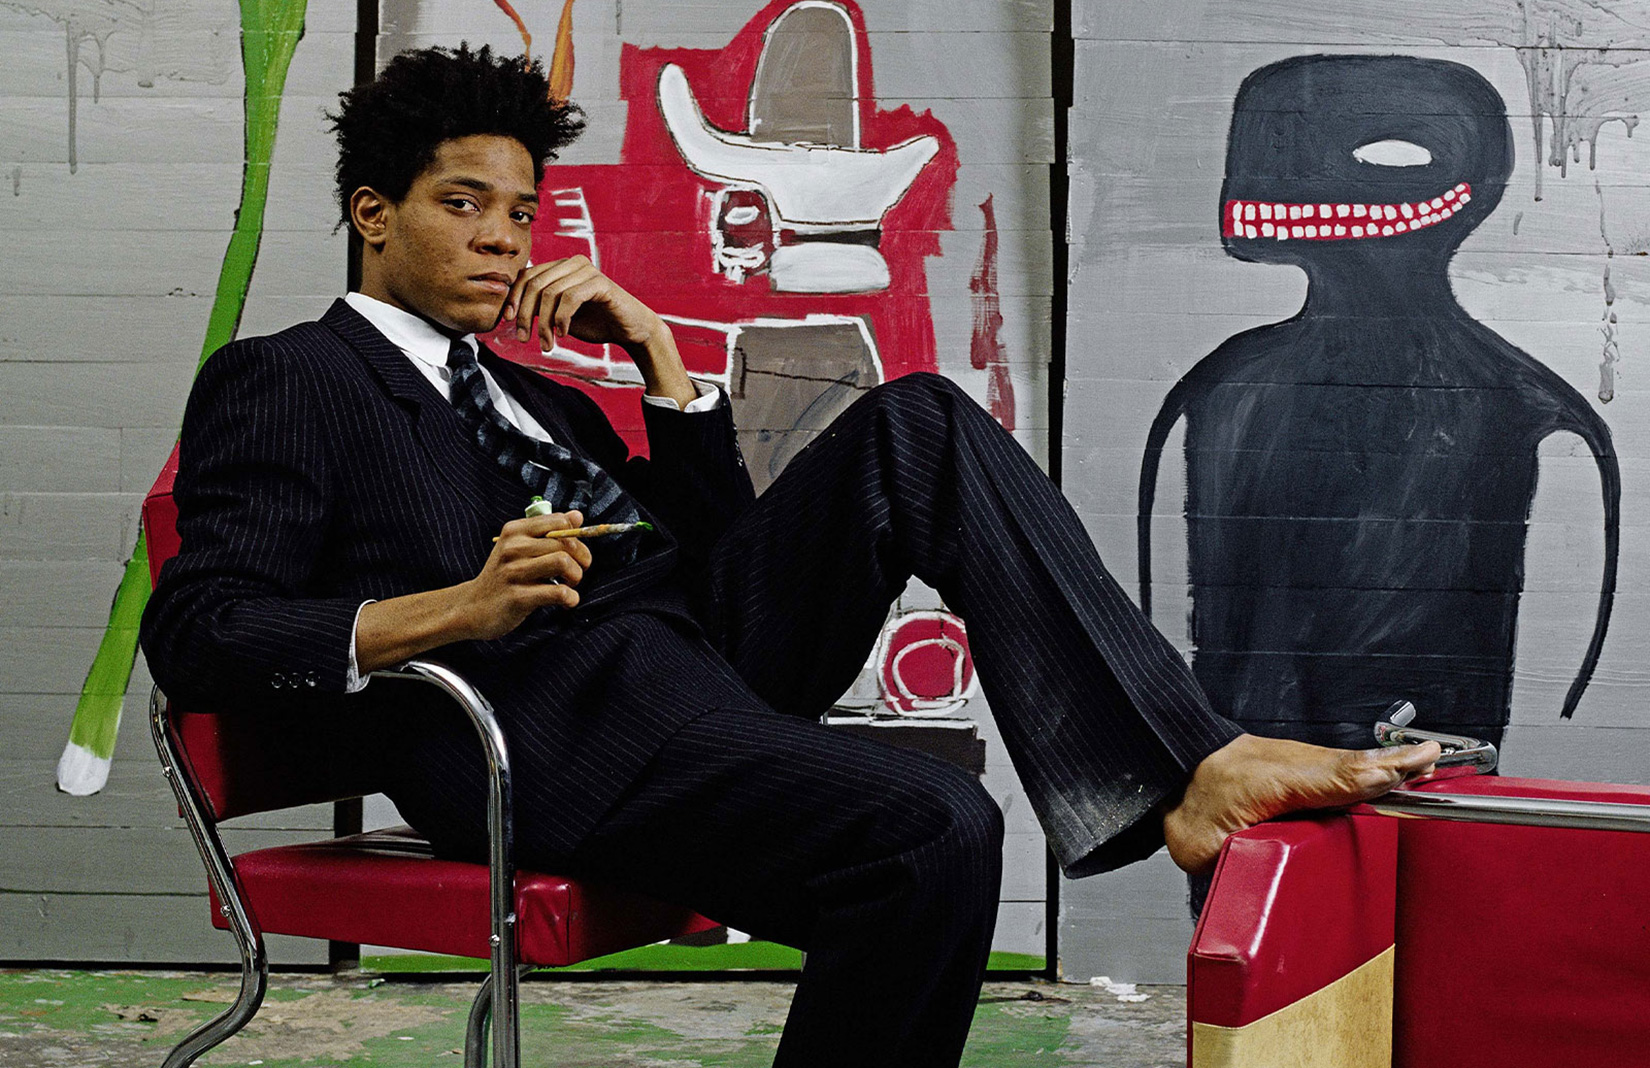 A barefoot Jean-Michel Basquiat wearing Giorgio Armani